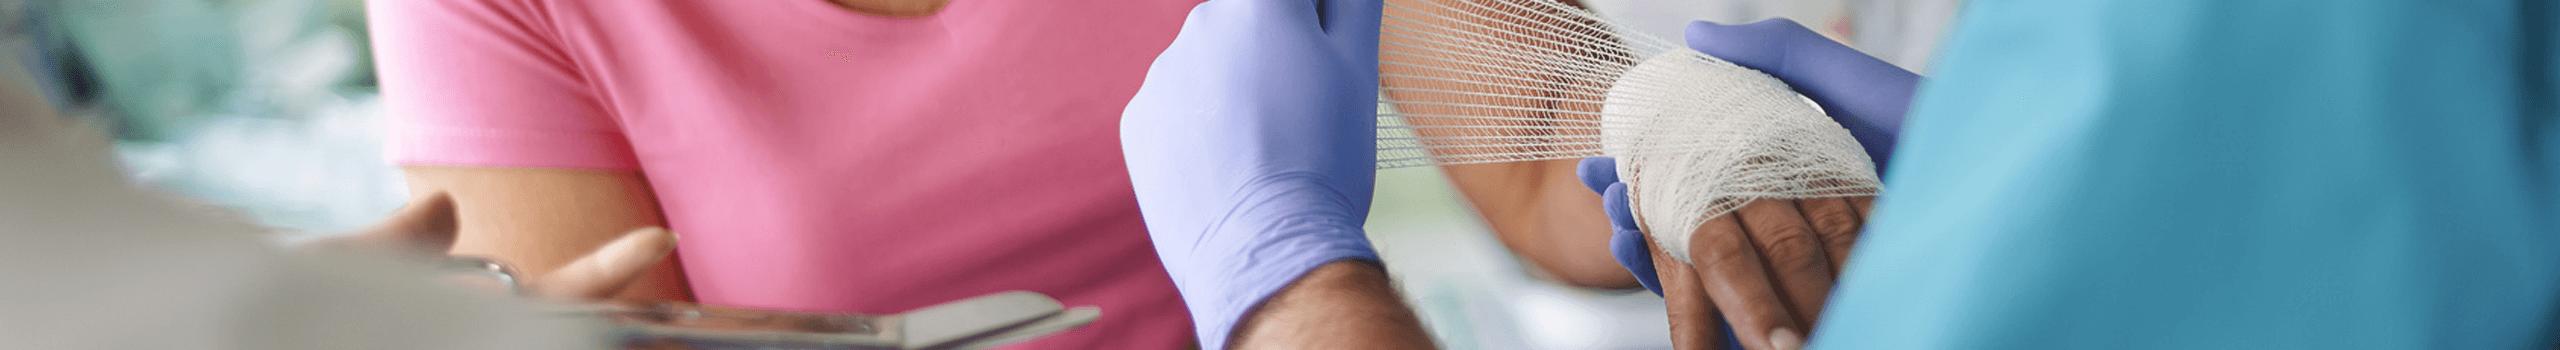 bandaging-hand-banner